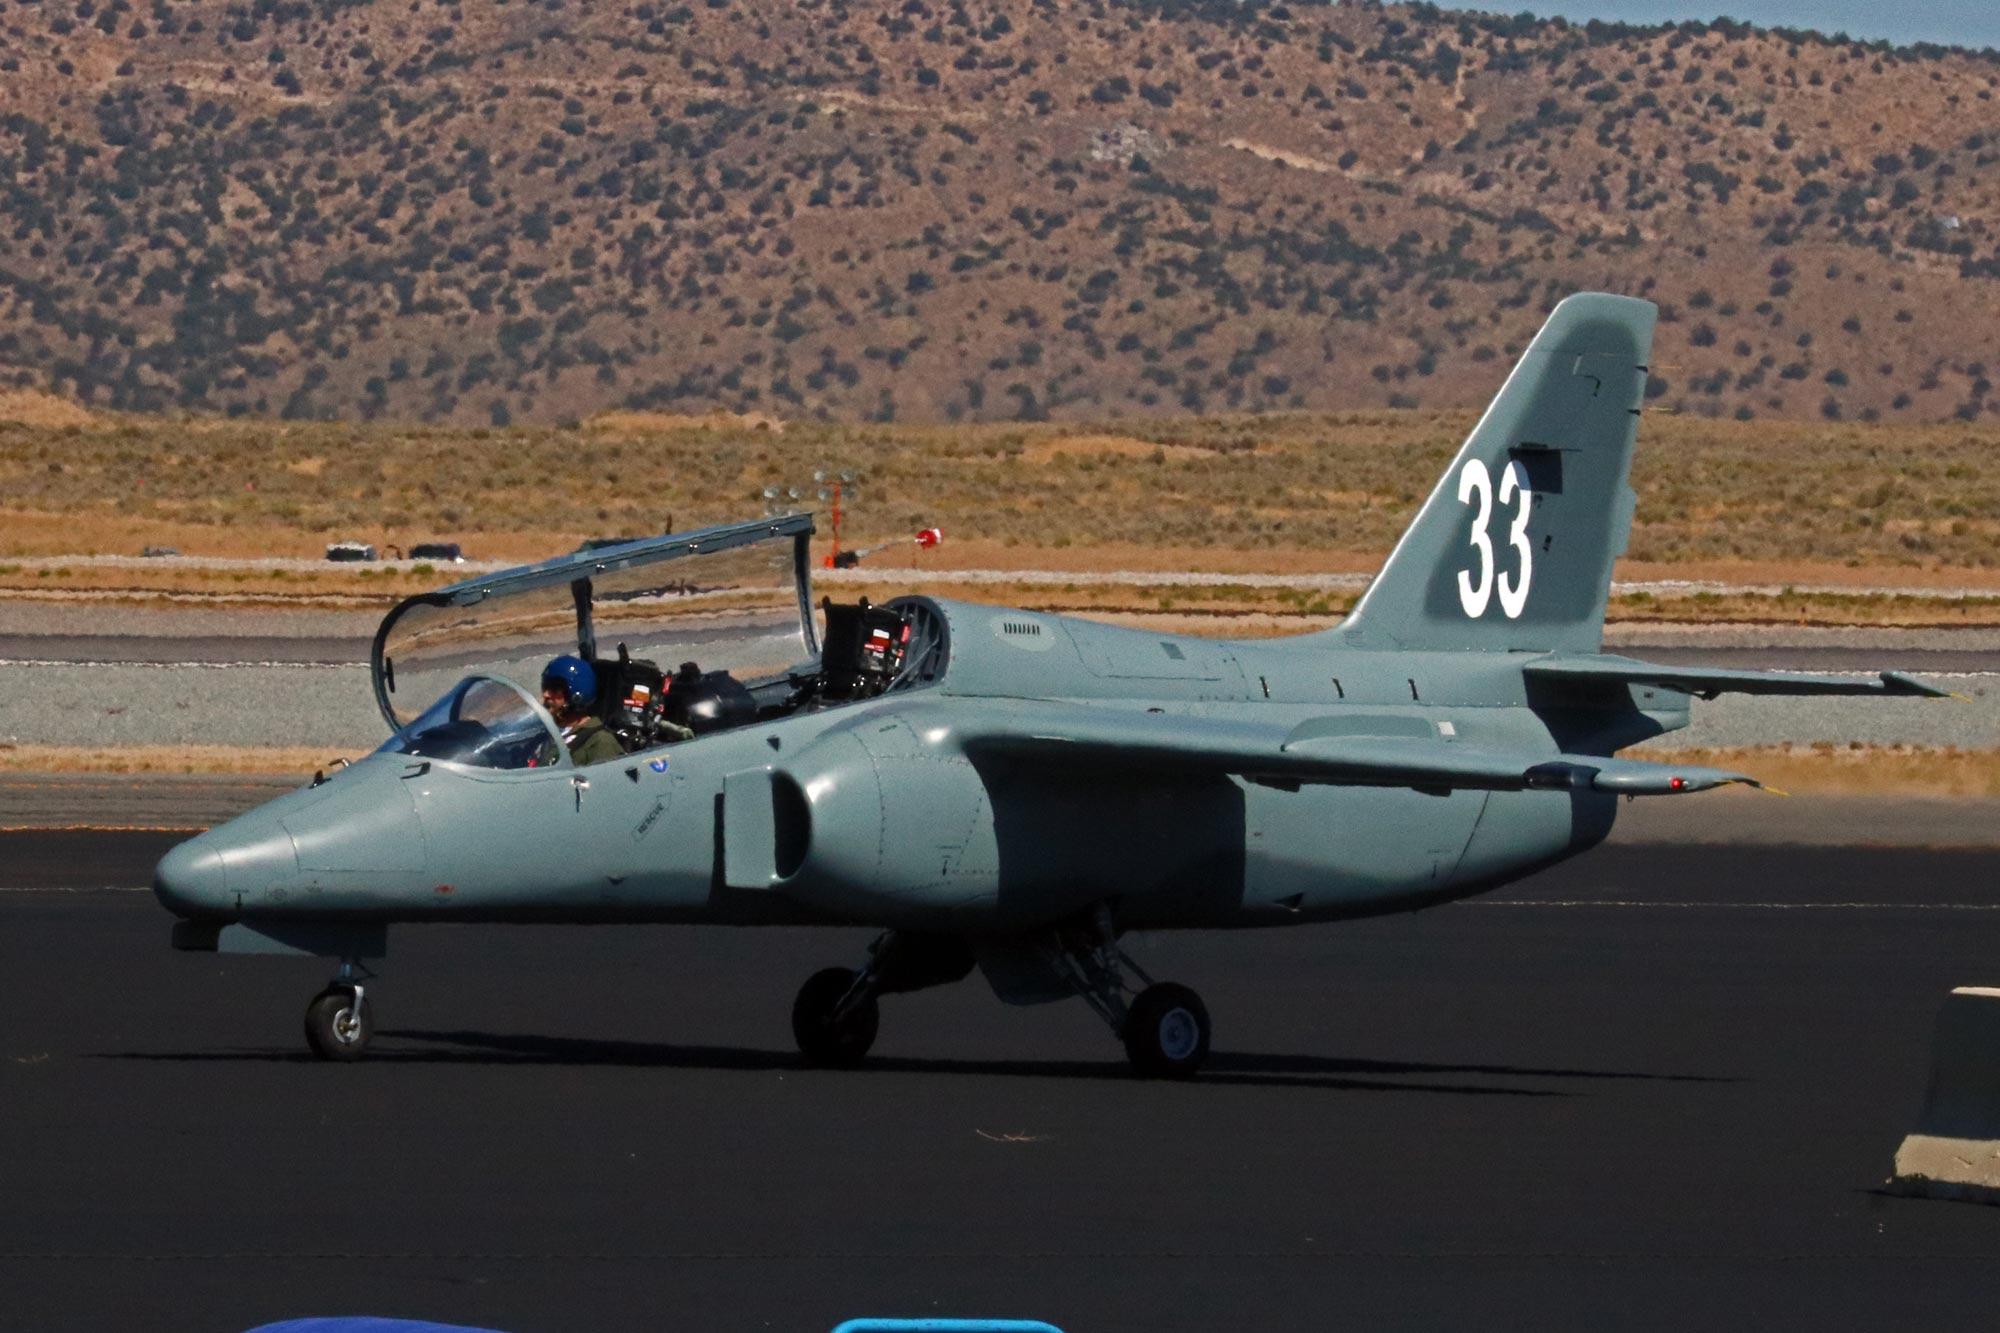 Jet-33-Heat1C-3rdPlace-160914Reno_0711